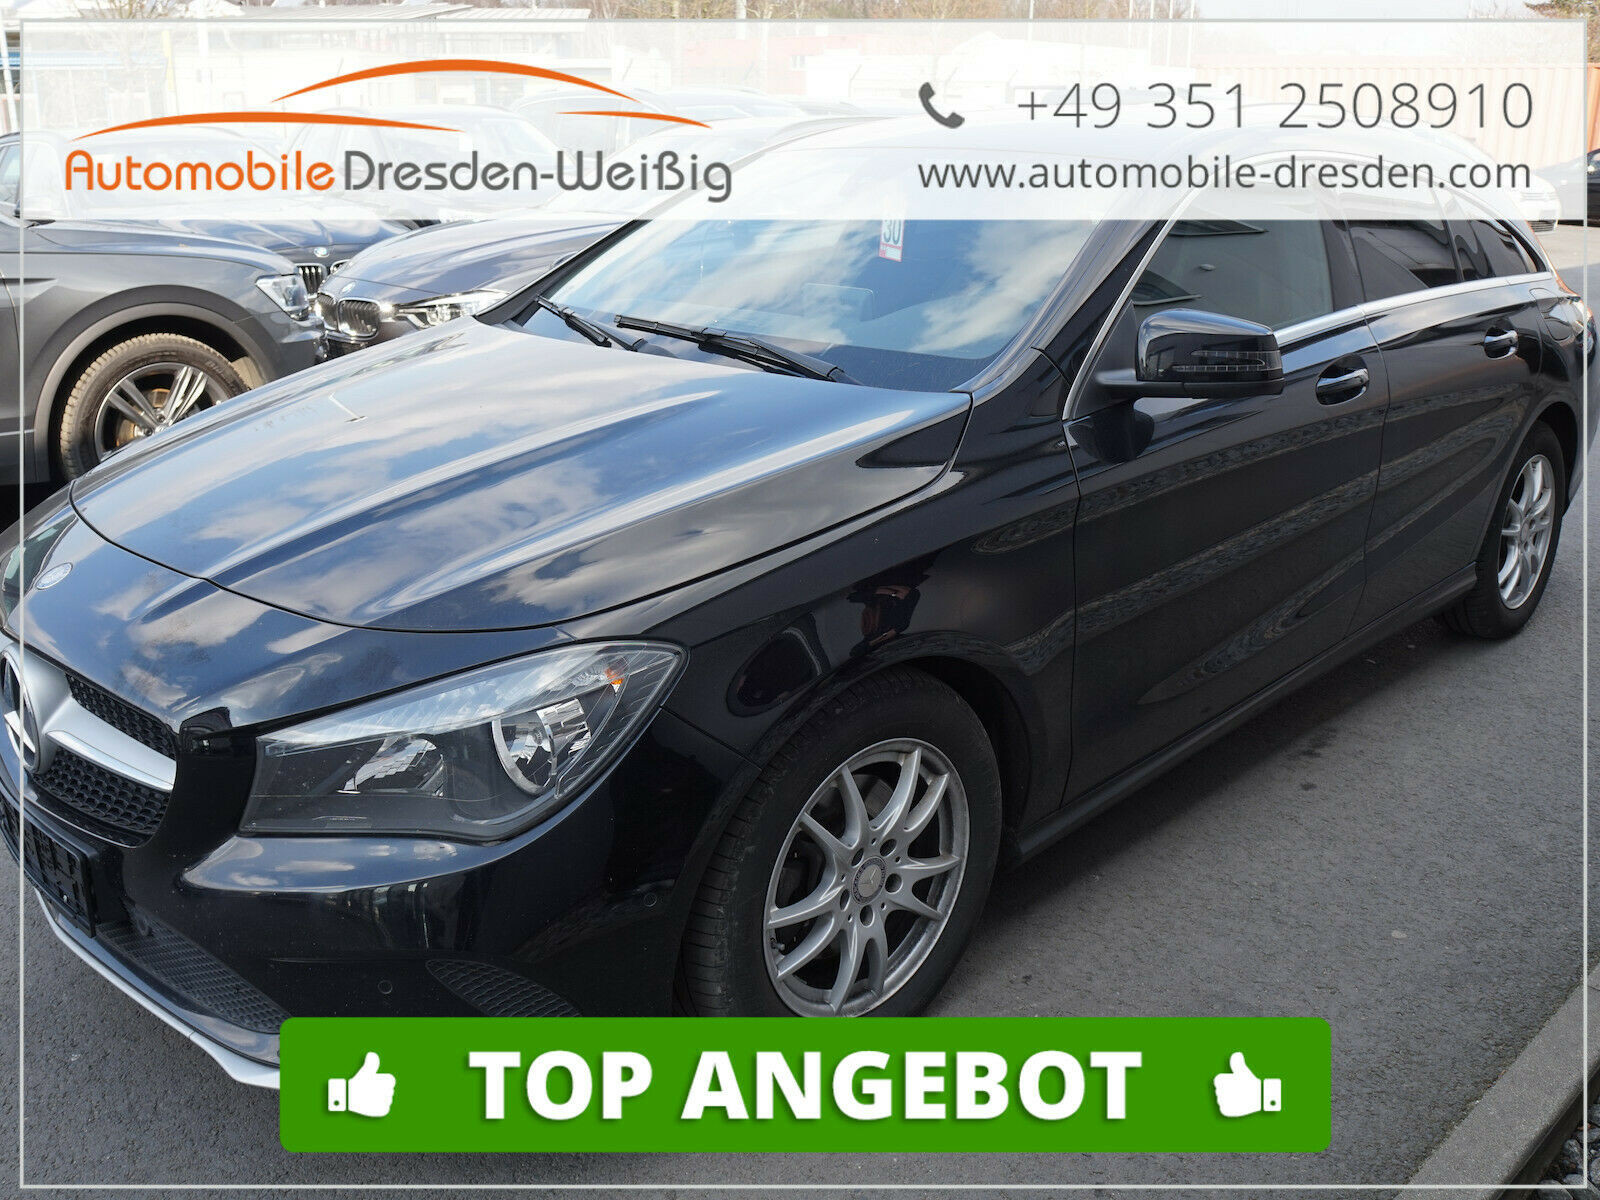 Mercedes-Benz CLA 200 Shooting Brake CDI / d Sport*Navi*Leder*, Jahr 2016, Diesel